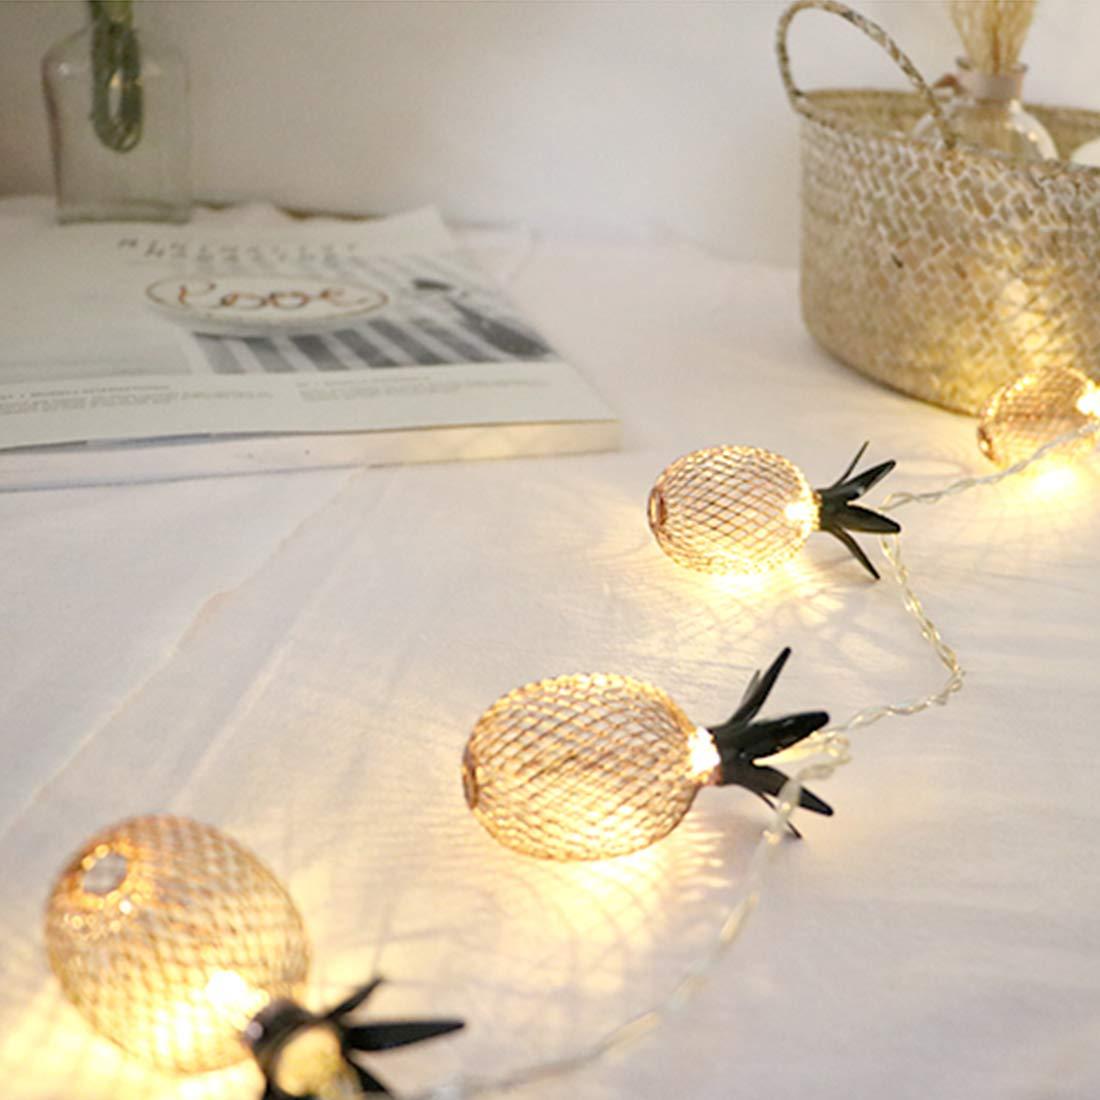 AVA Pineapple String Decor Lights 10ft 10 Led 20 Led Lantern Fairy String Lights Battery Powered for Home Christmas Wedding Patio Party Festival Decoration Warm White